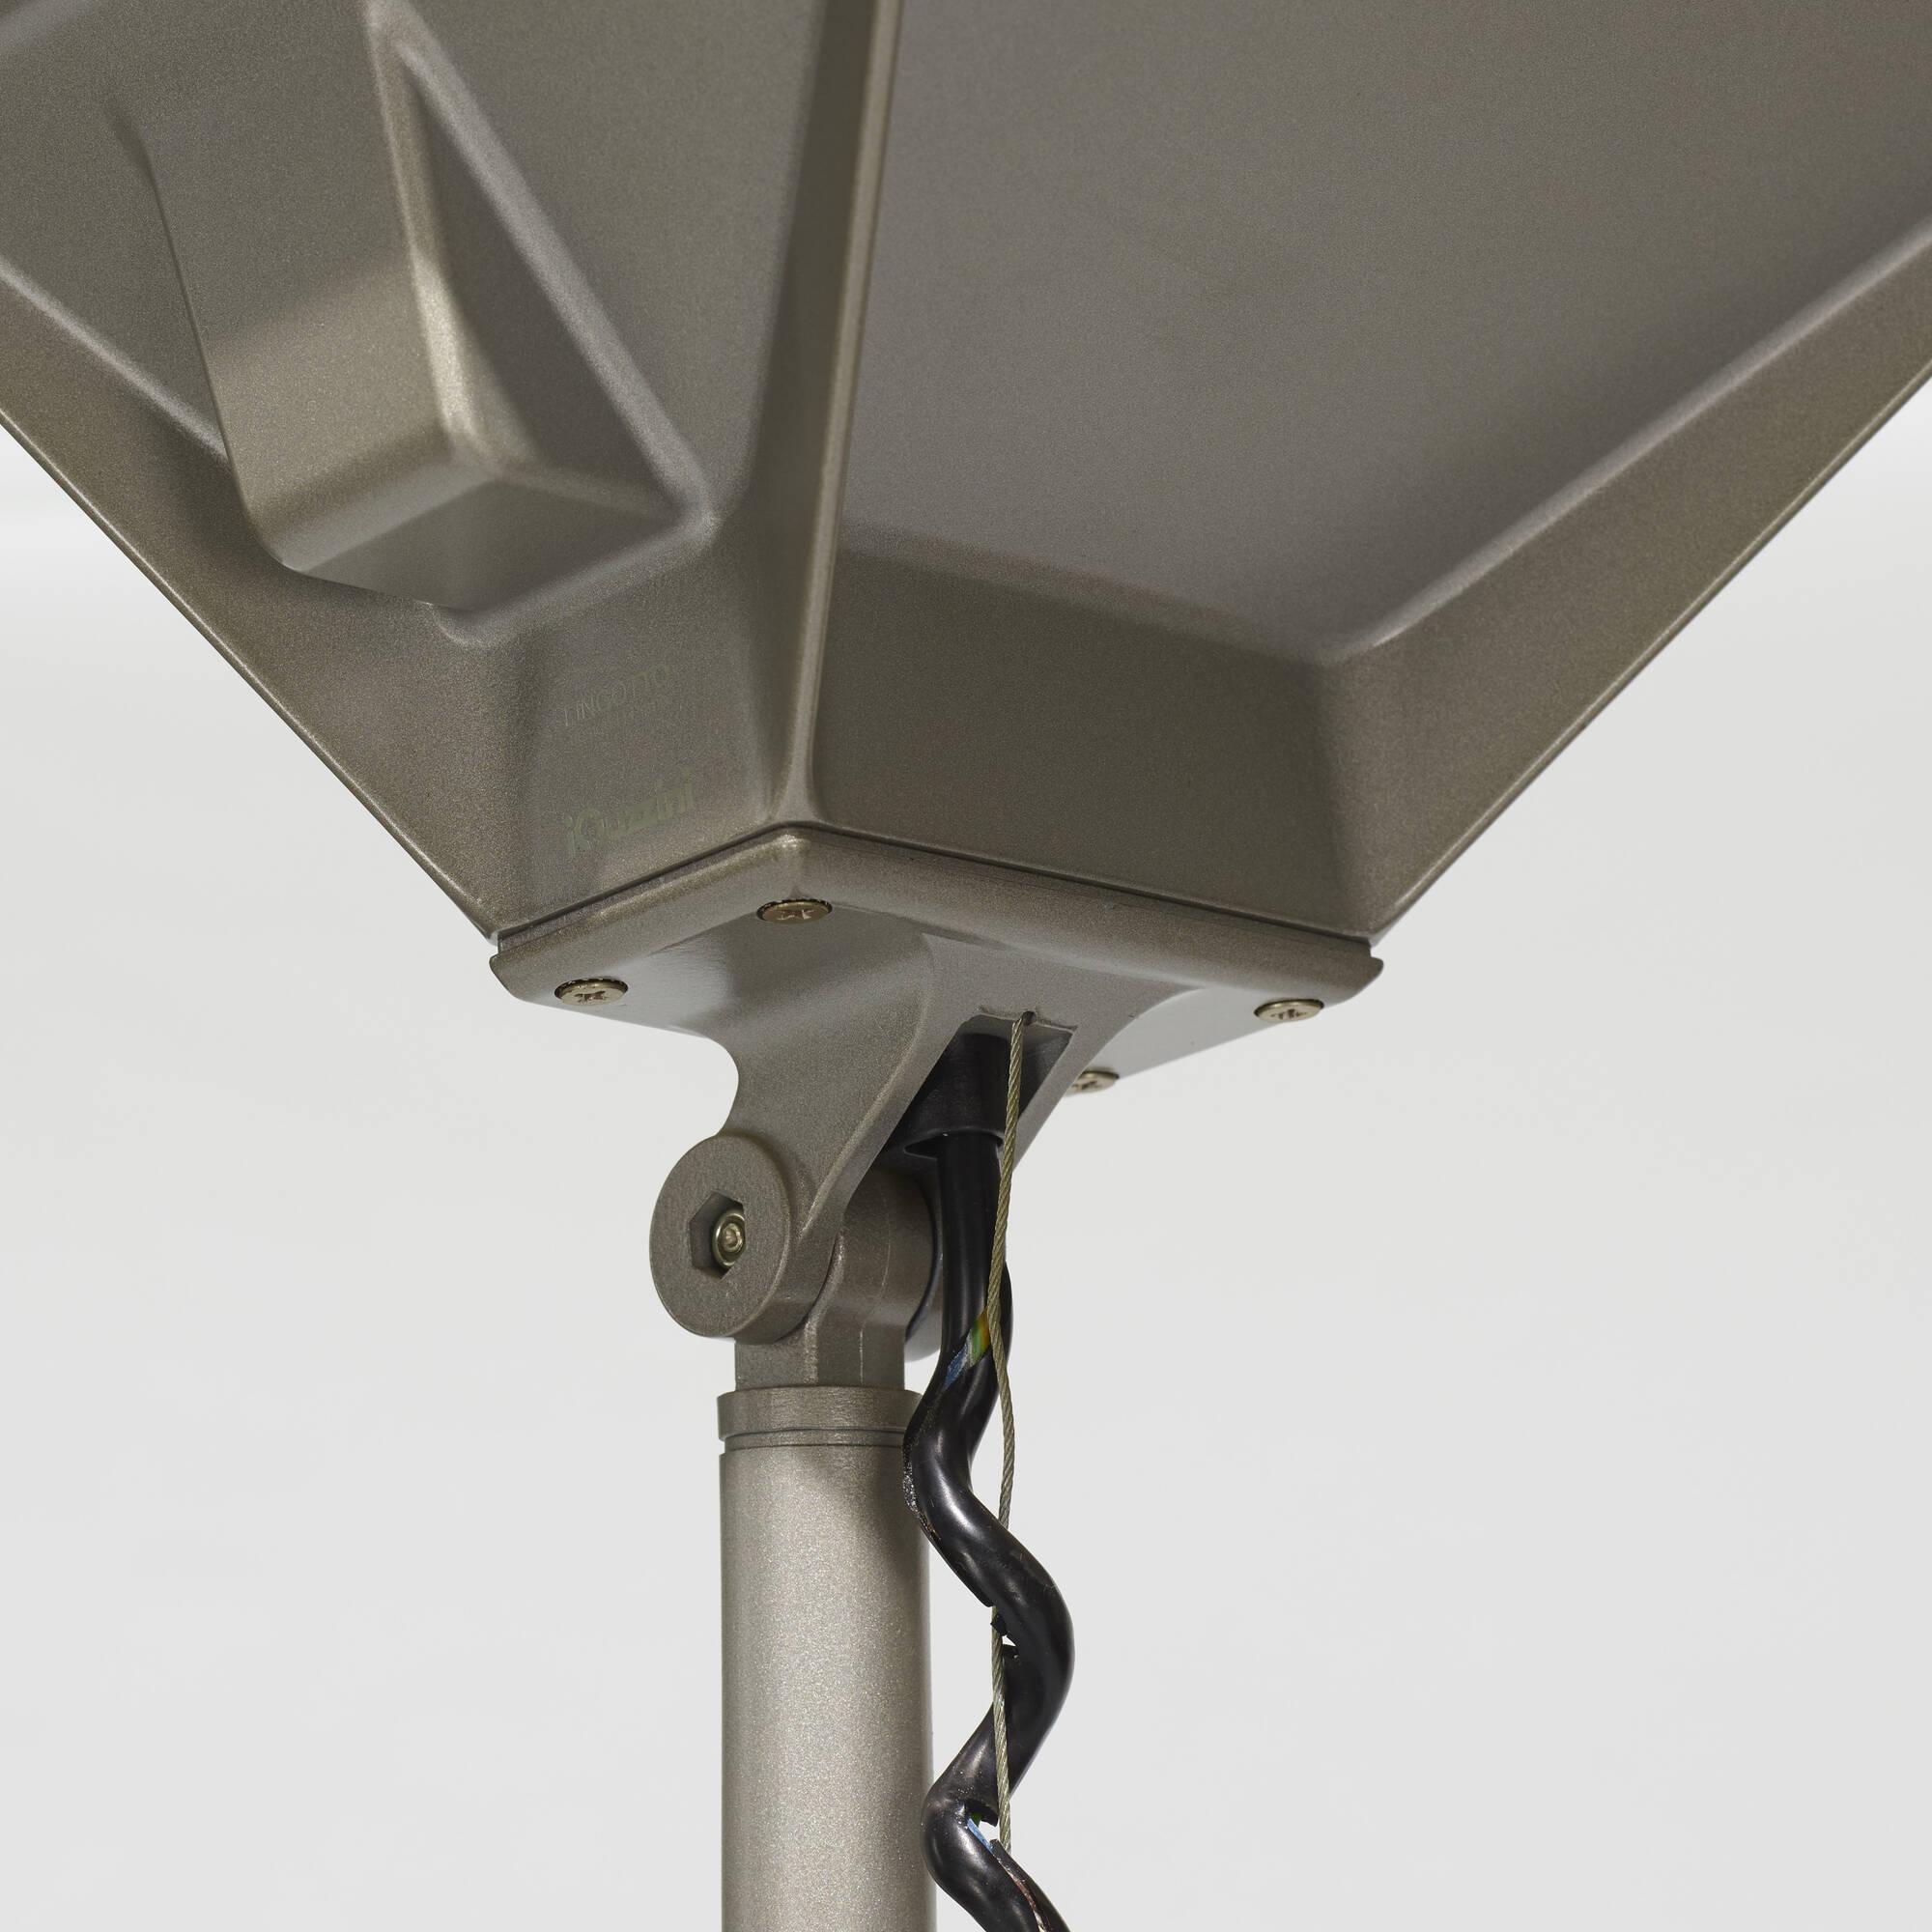 380: Renzo Piano / Lingotto floor lamp (2 of 2)